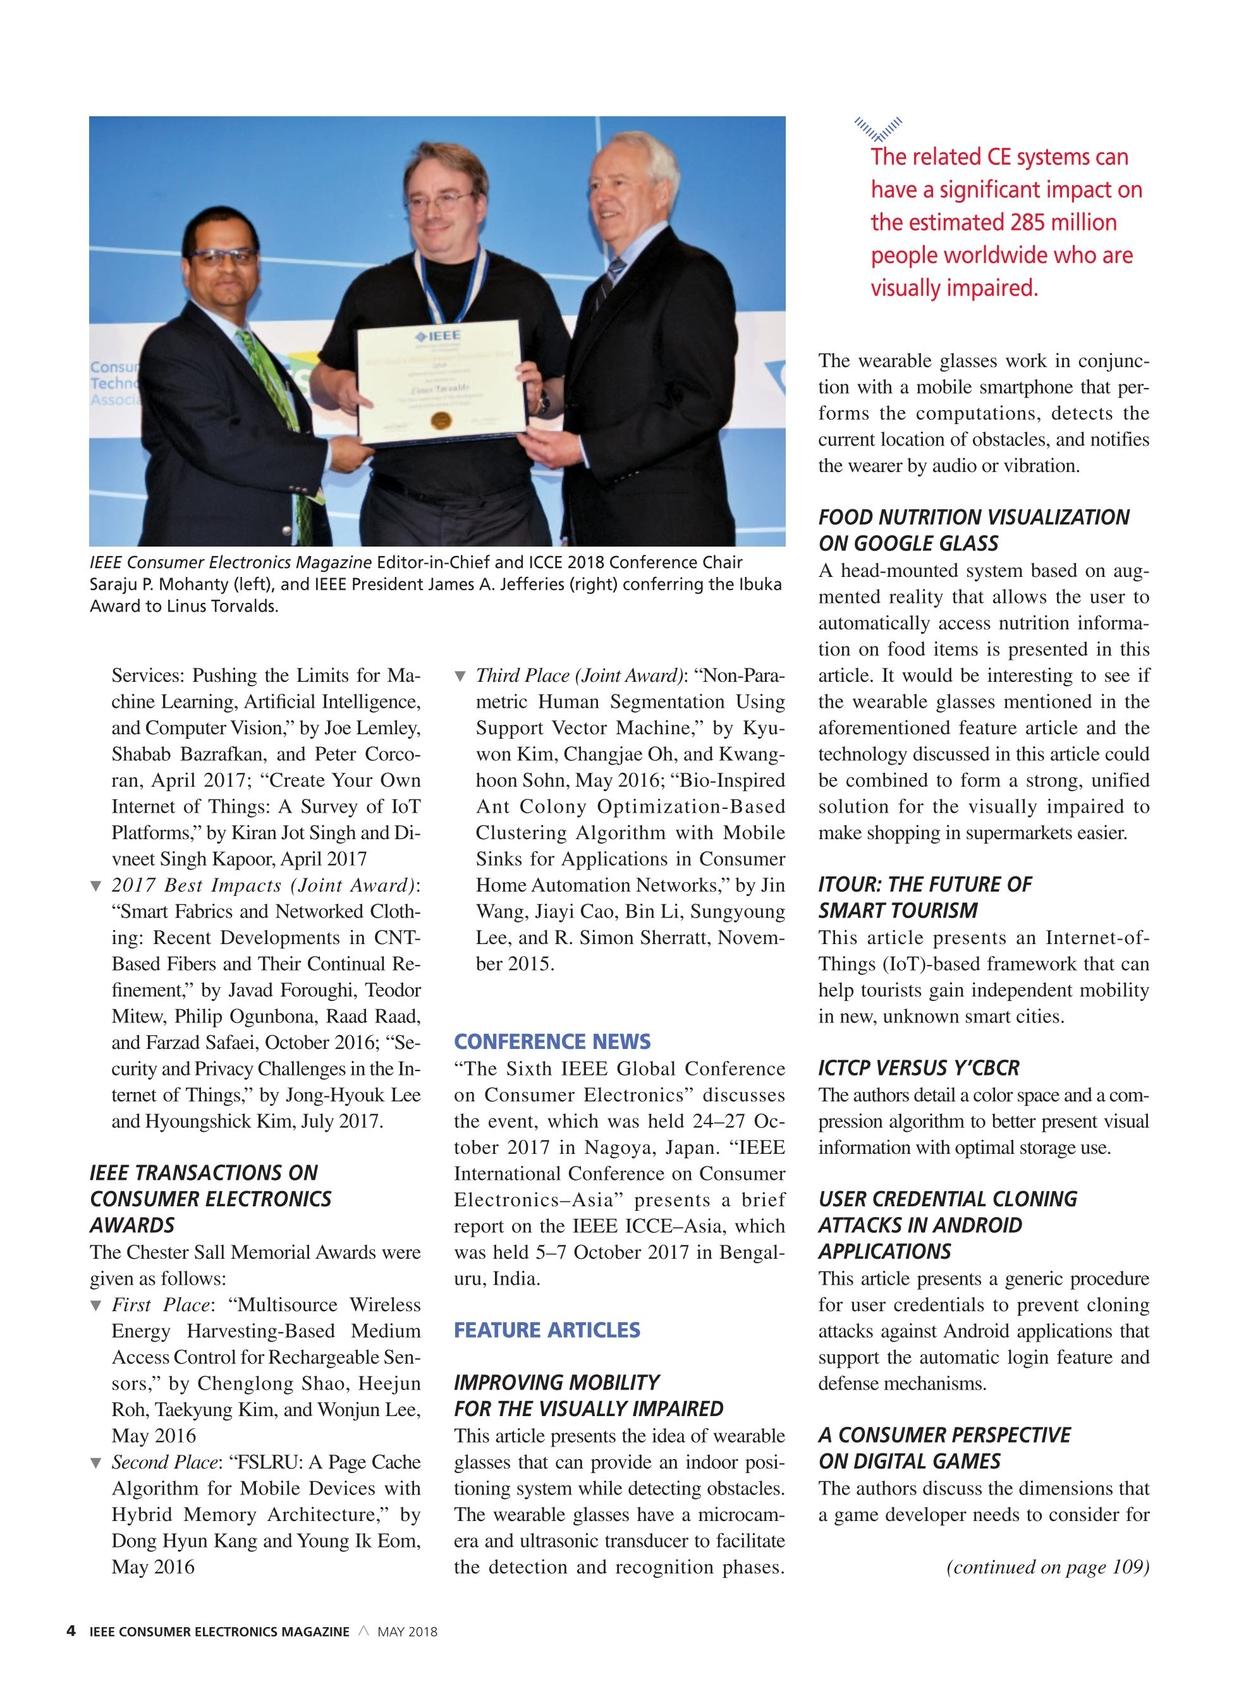 IEEE Consumer Electronics Magazine - May 2018